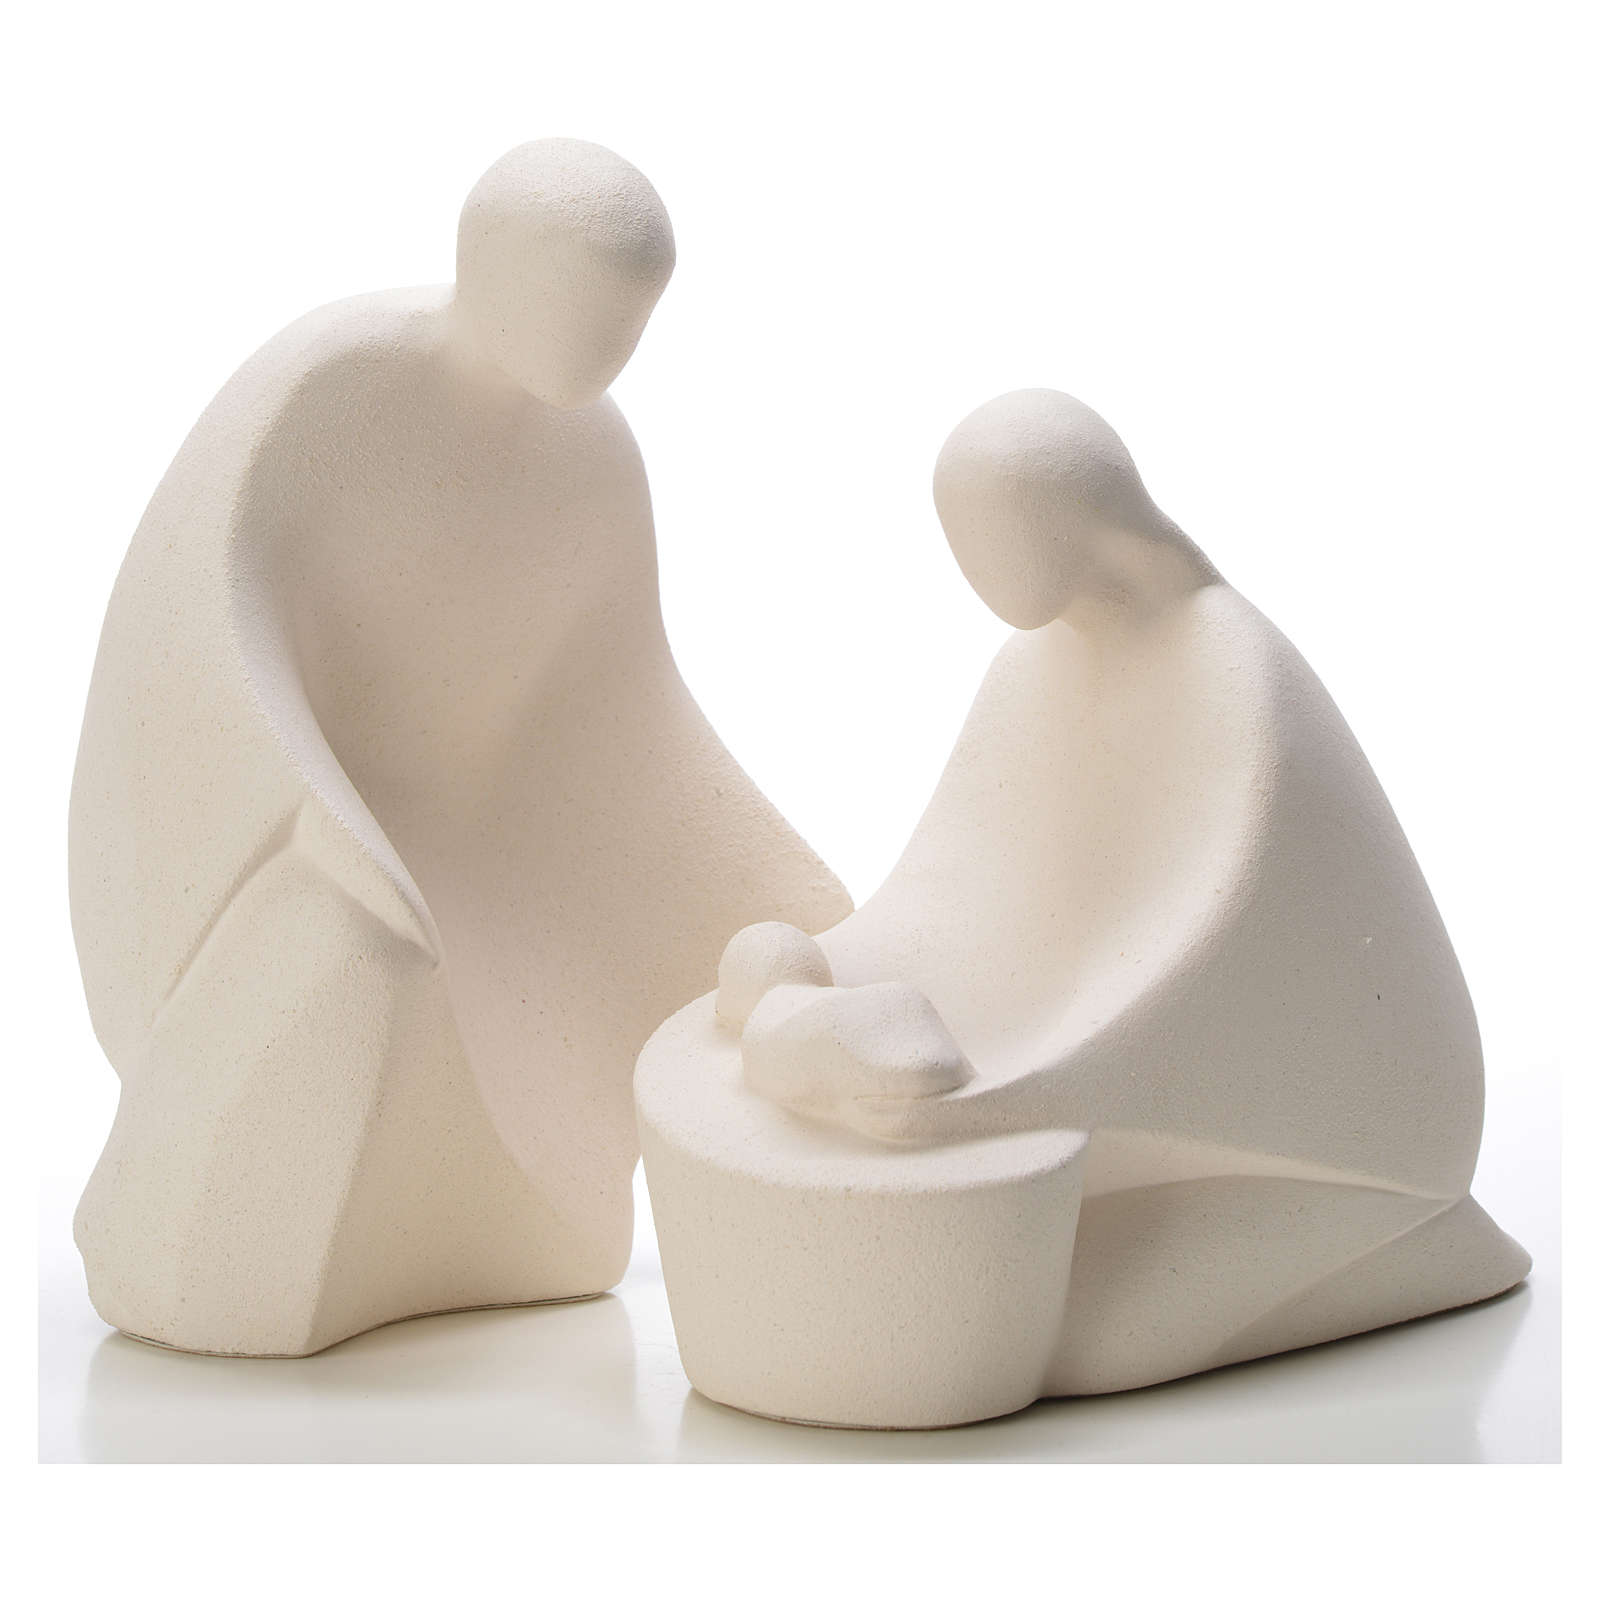 Presepe Navidad argilla Ceramica Ave 3